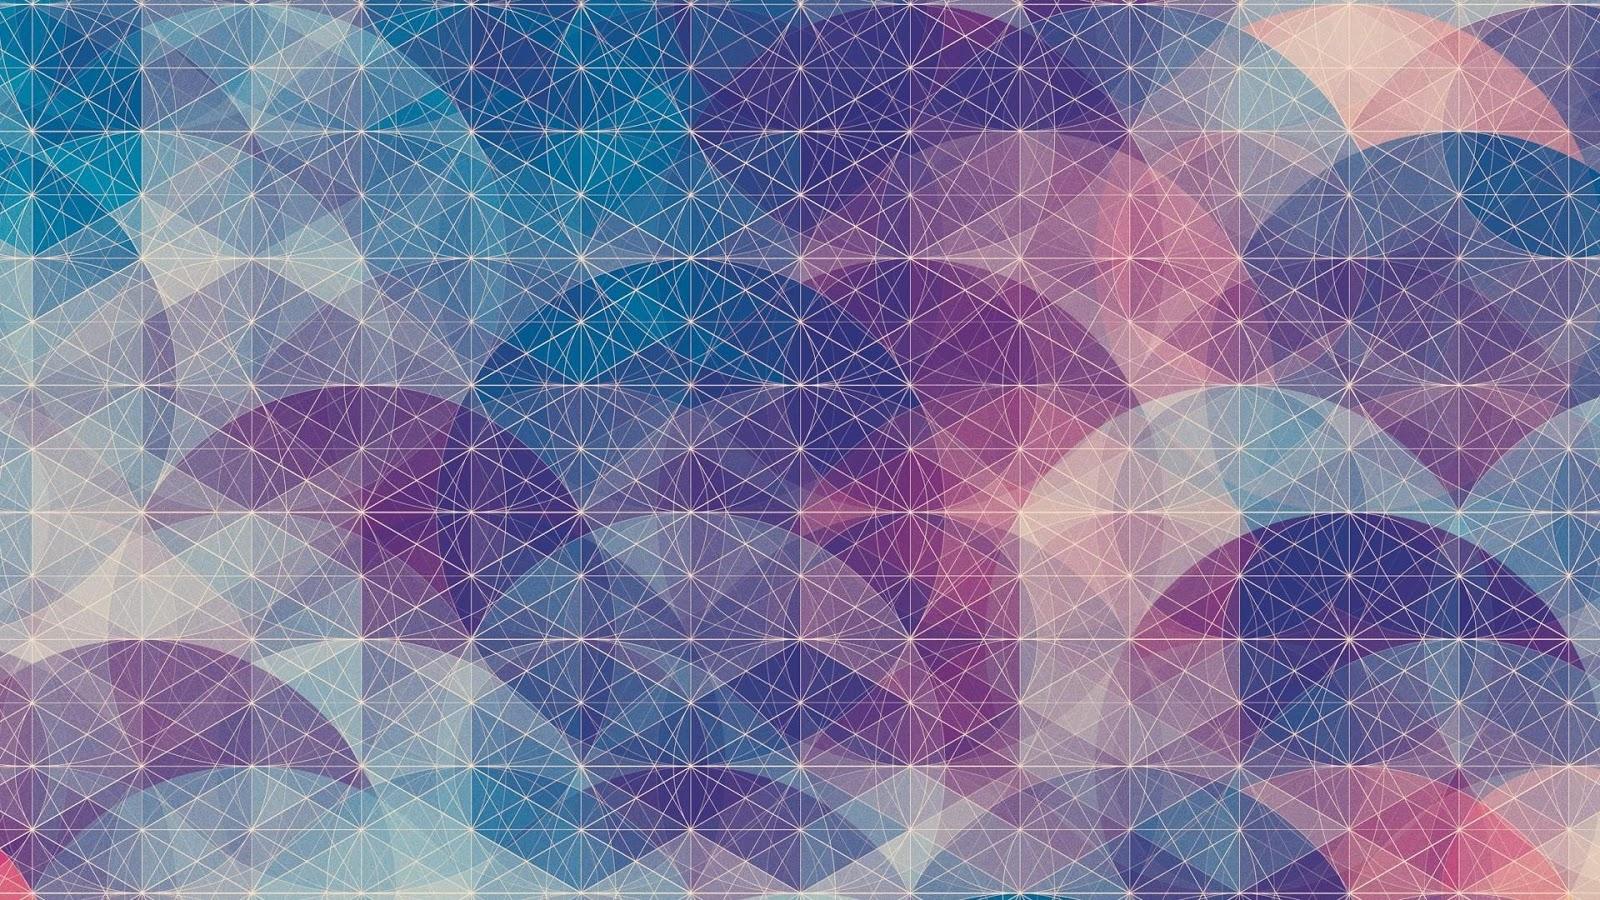 Best 39 Geometric Desktop Backgrounds on HipWallpaper Beautiful 1600x900